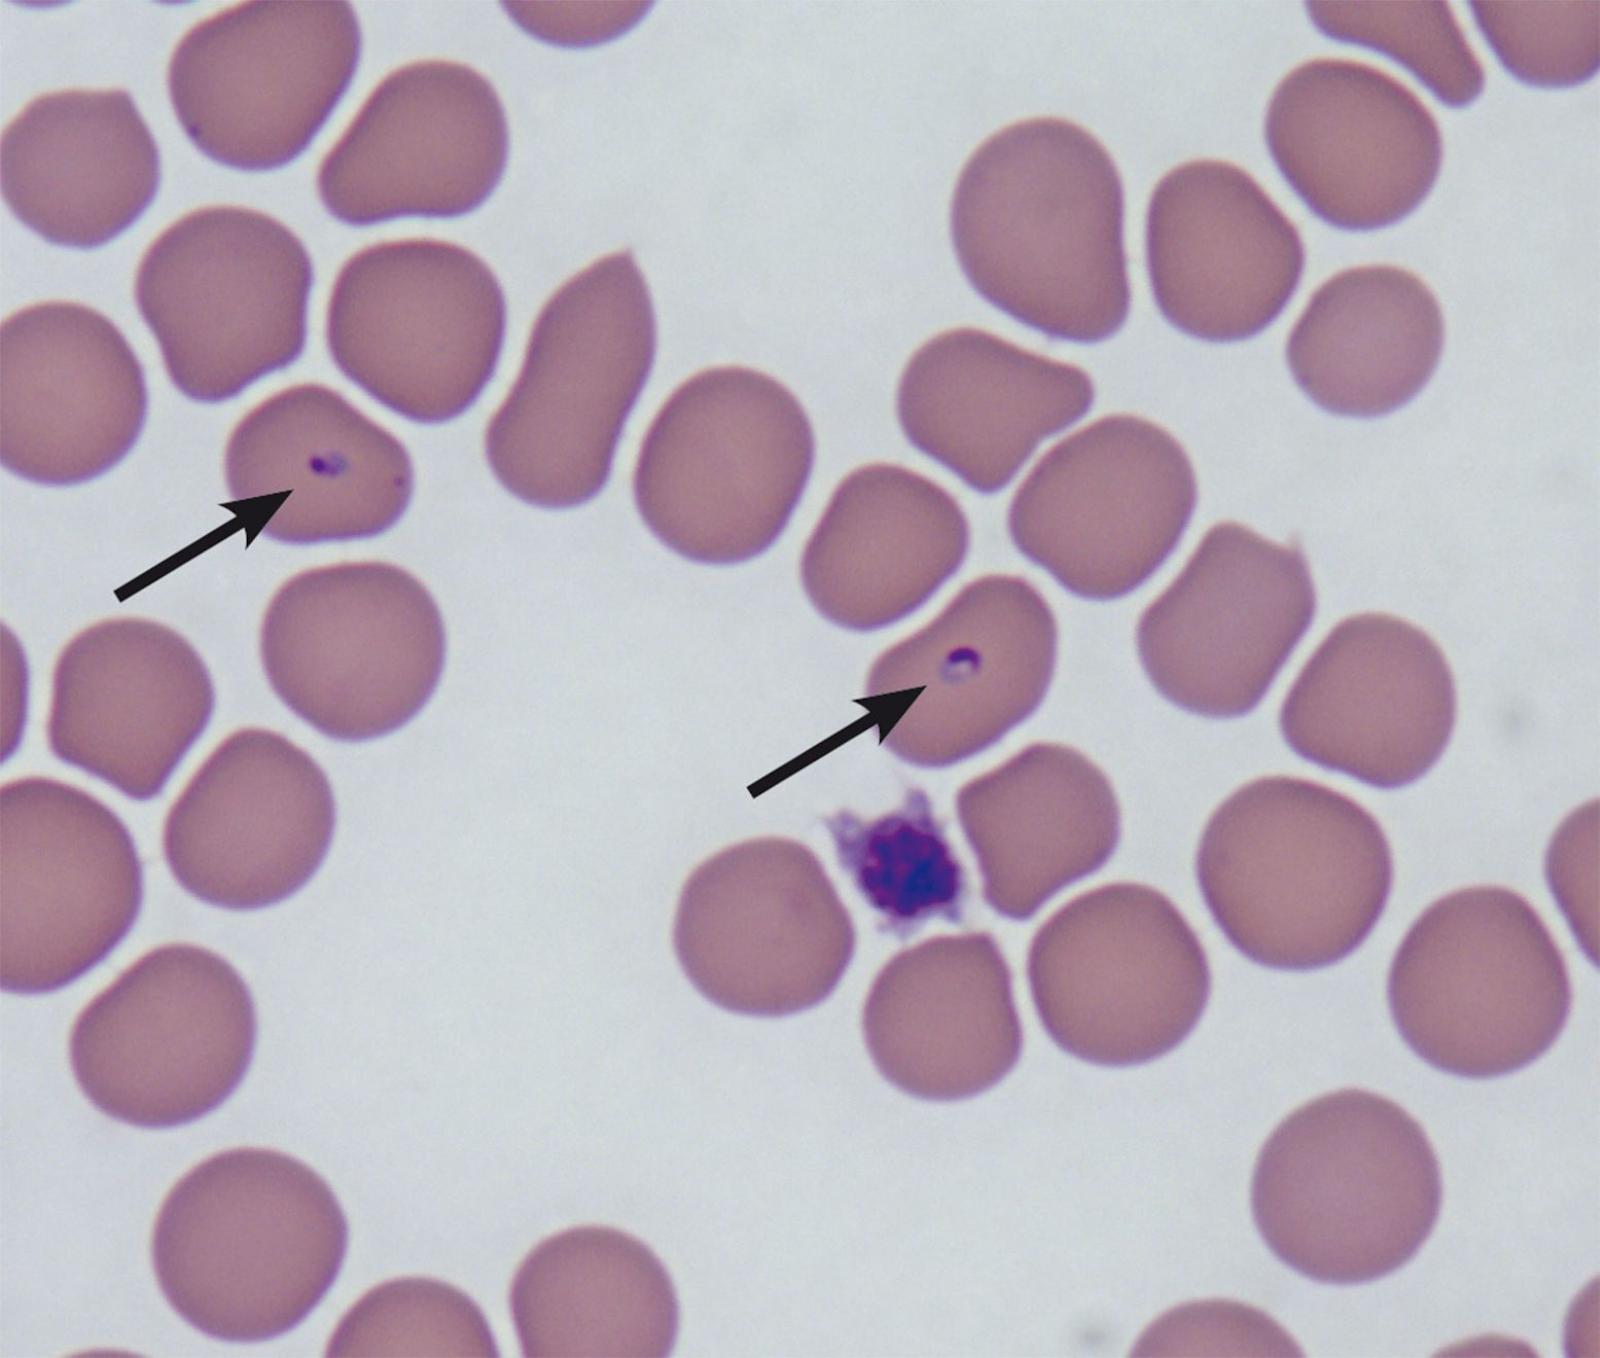 Trofozoiti intracellulari di Babesia Felis